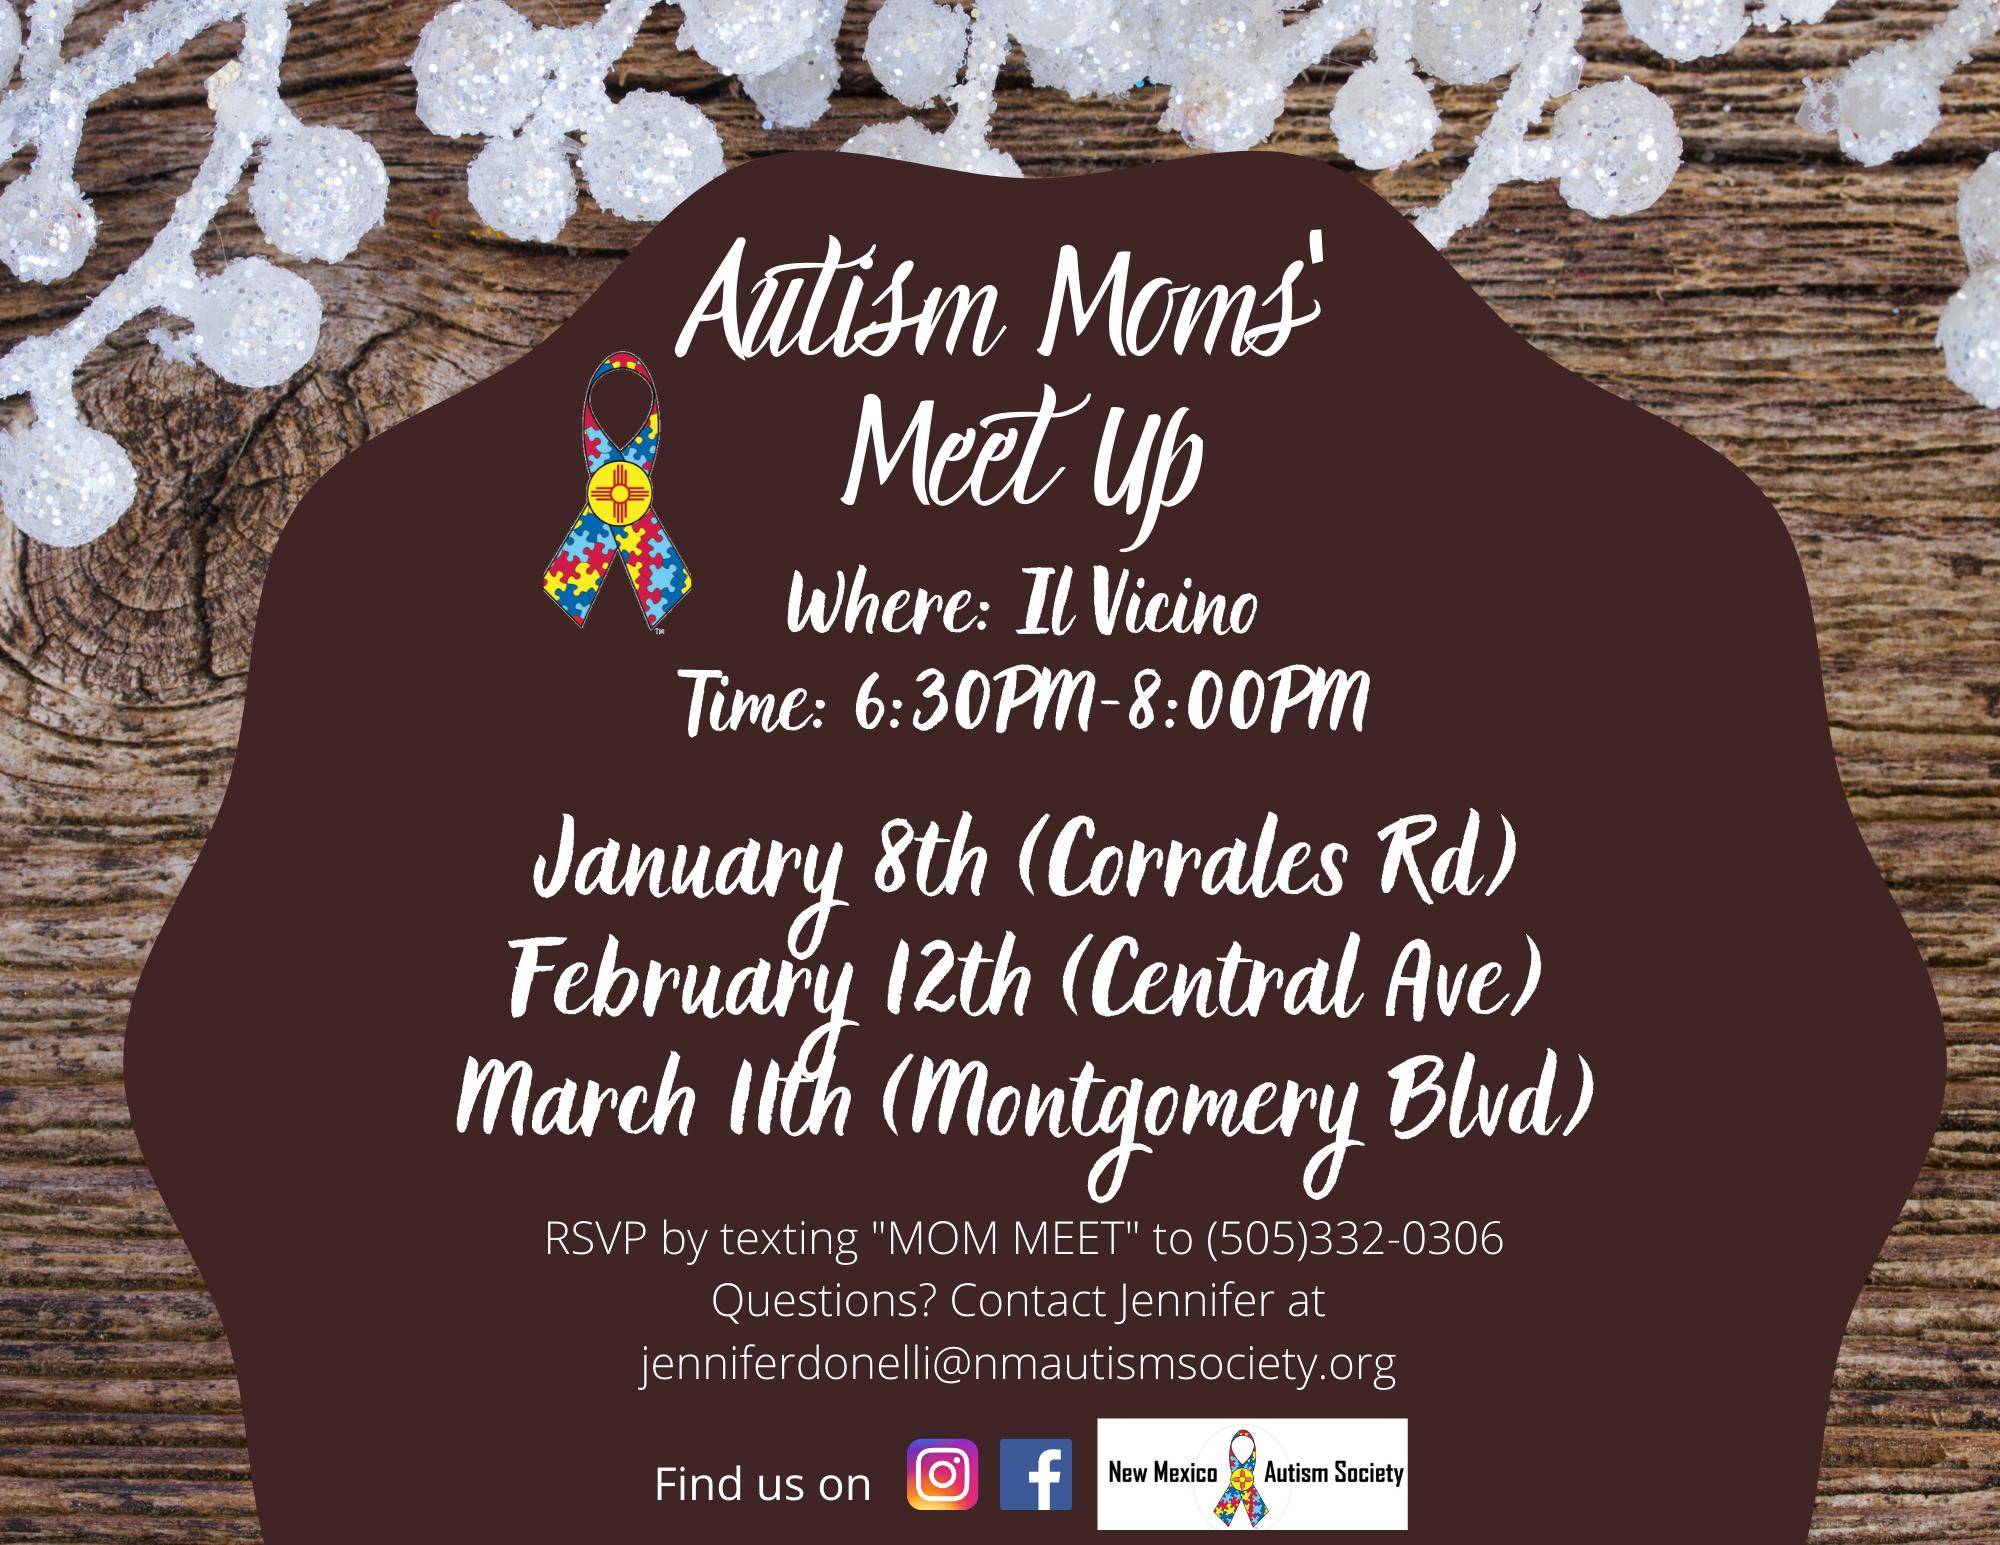 Autism Moms' Meet Up Image